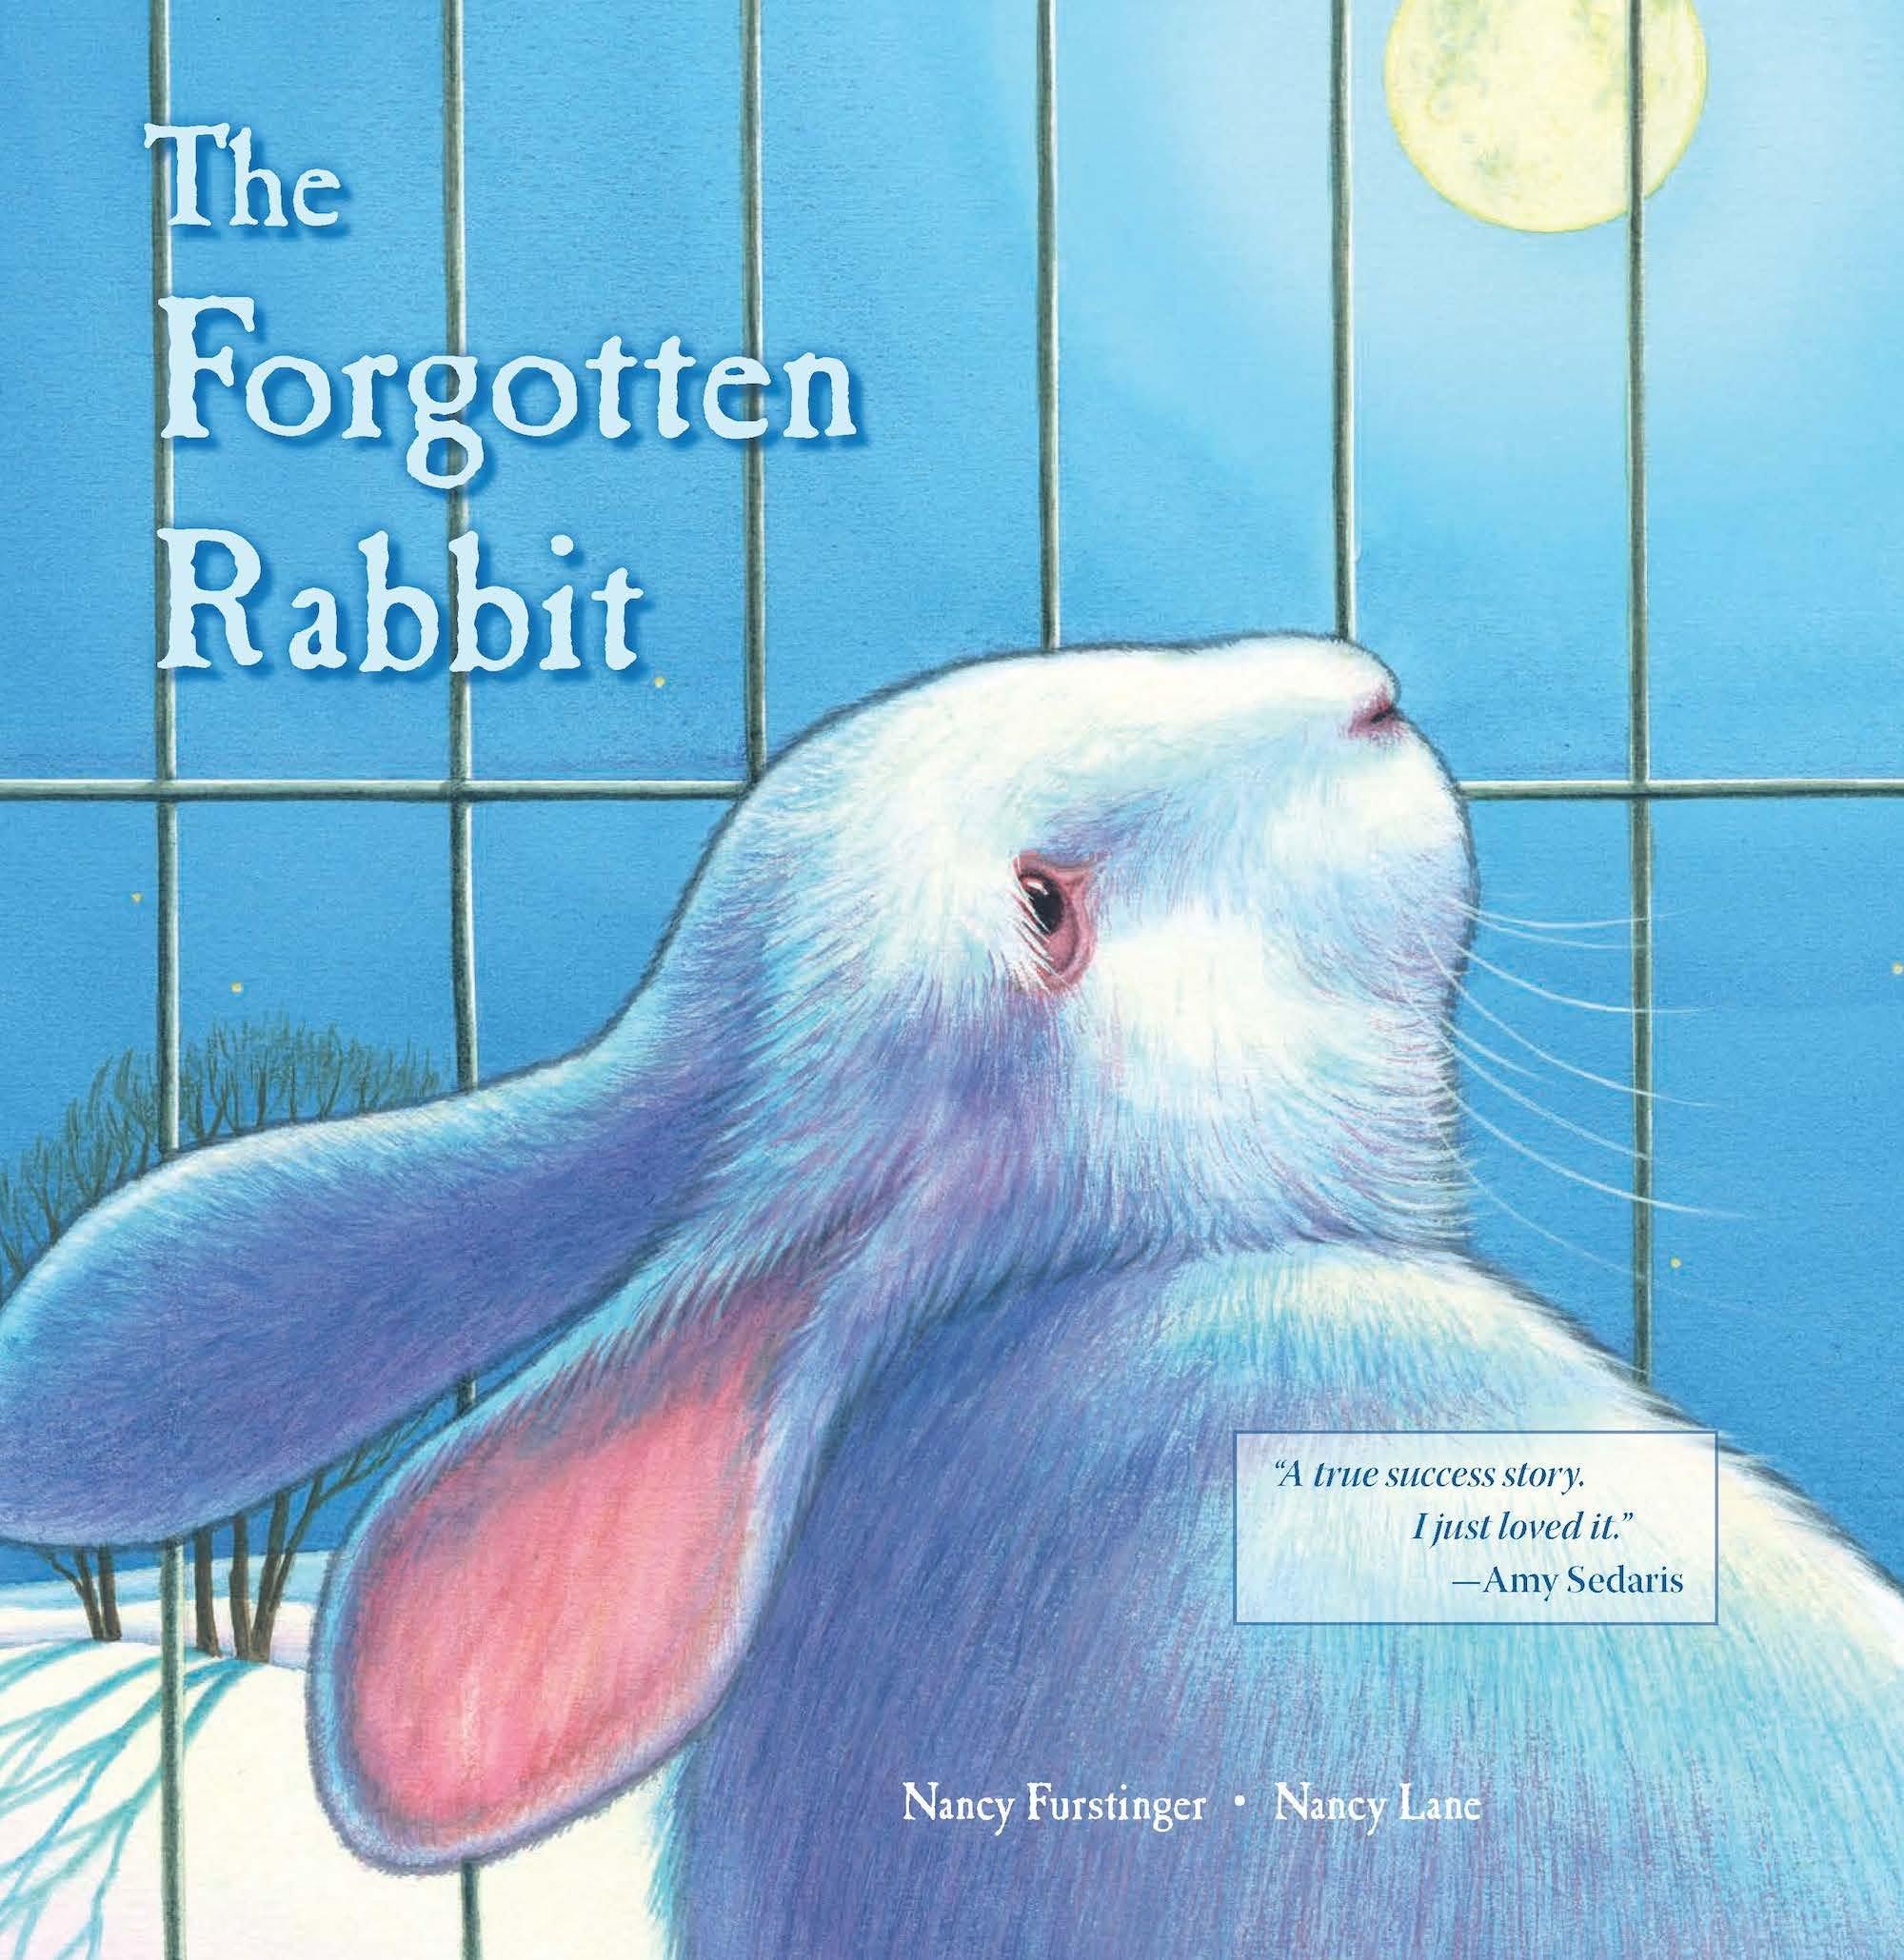 The Forgotten Rabbit